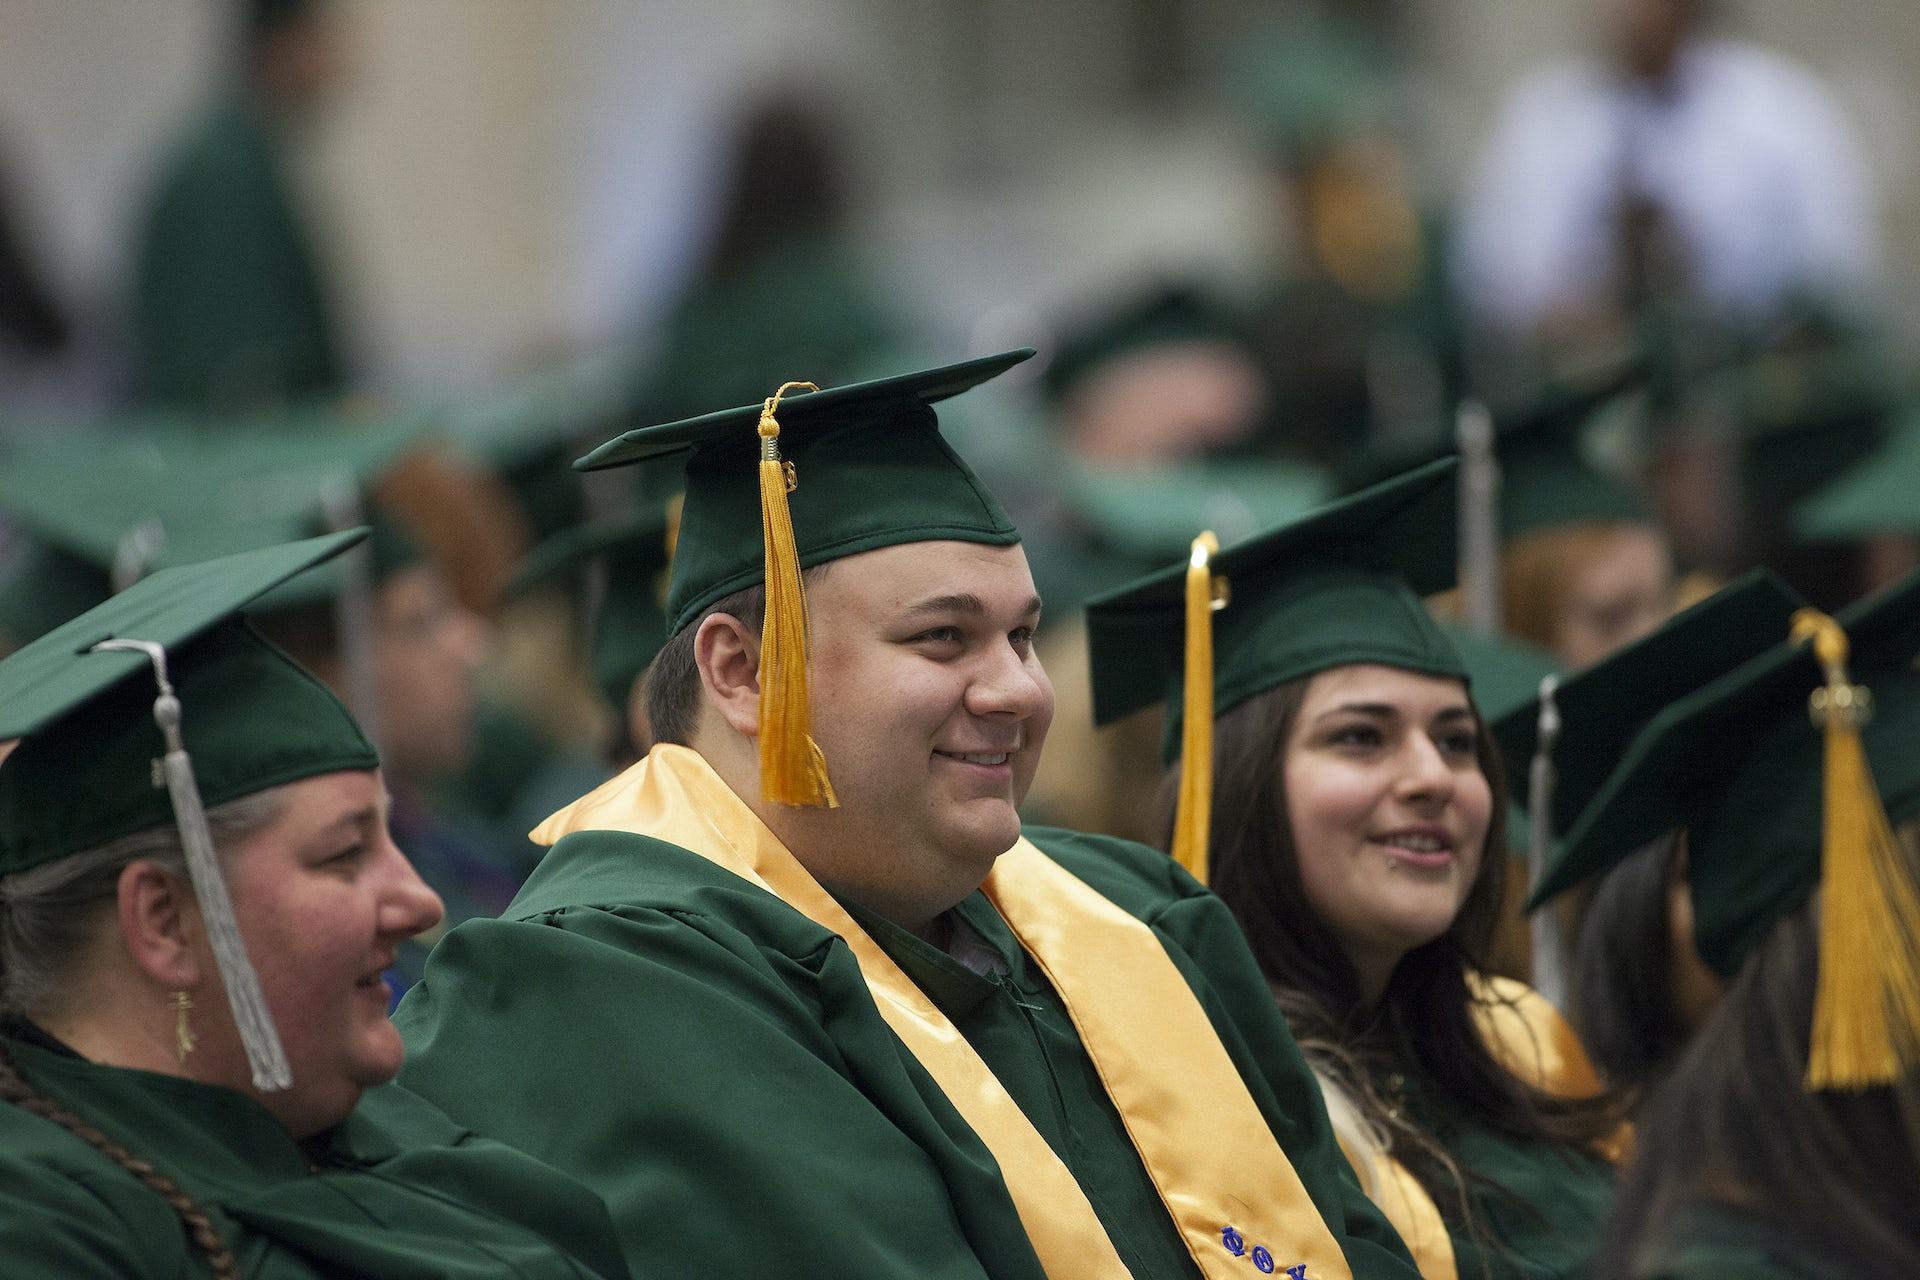 Adult article challenge graduate learner study